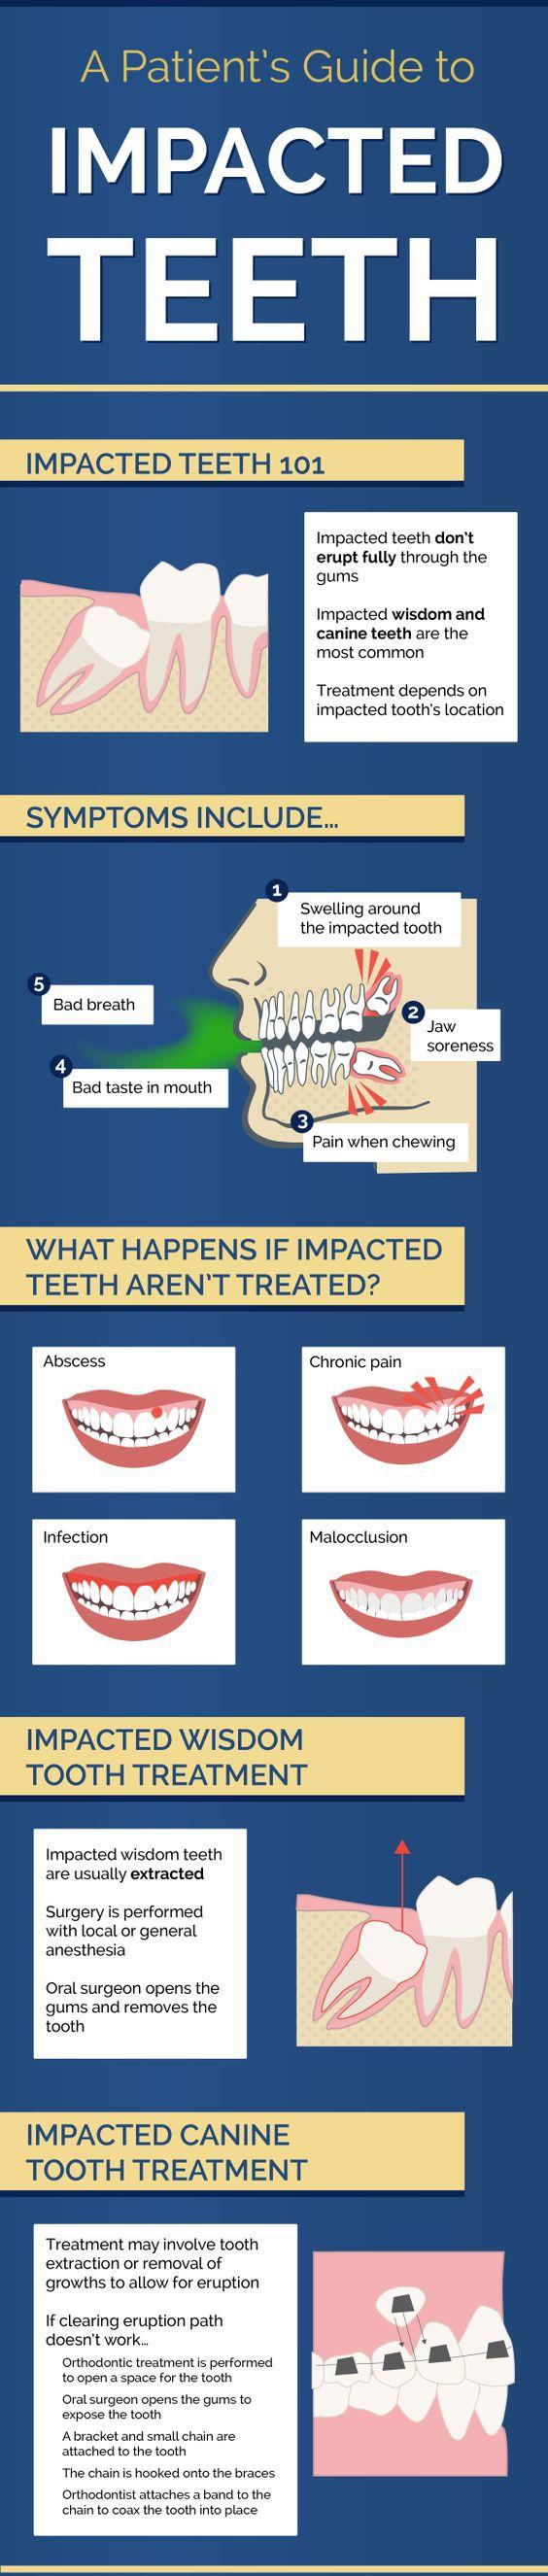 42 best wisdom teeth images on pinterest  dental care dental and dental procedures